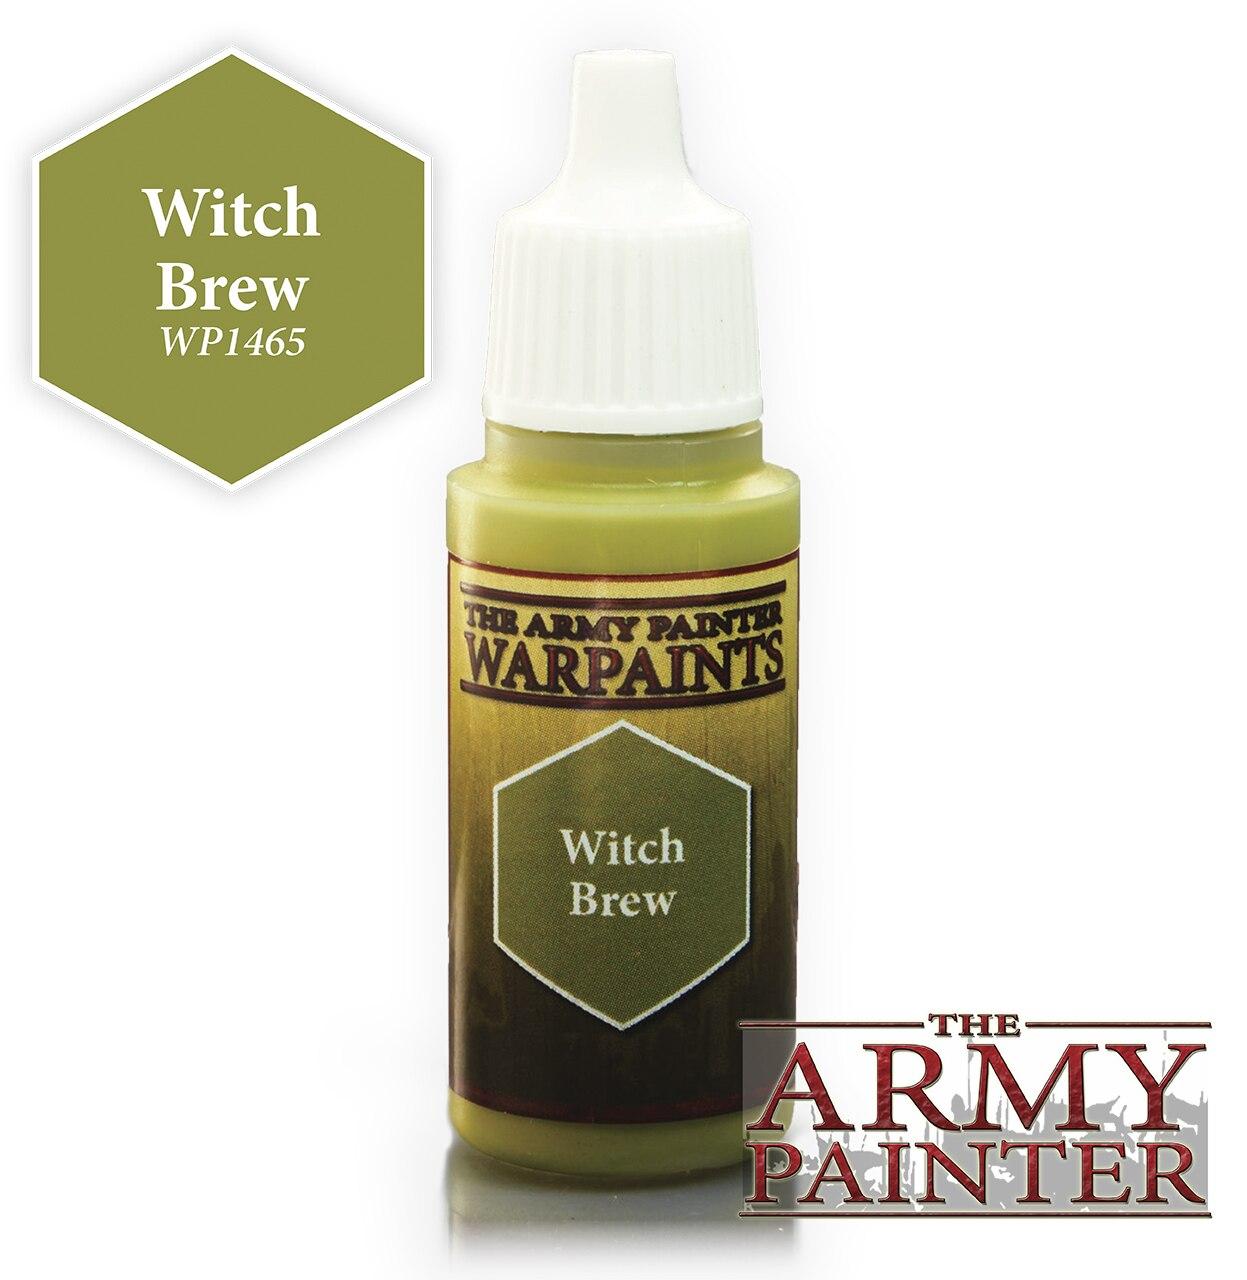 Army Painter Warpaint - Witch Brew